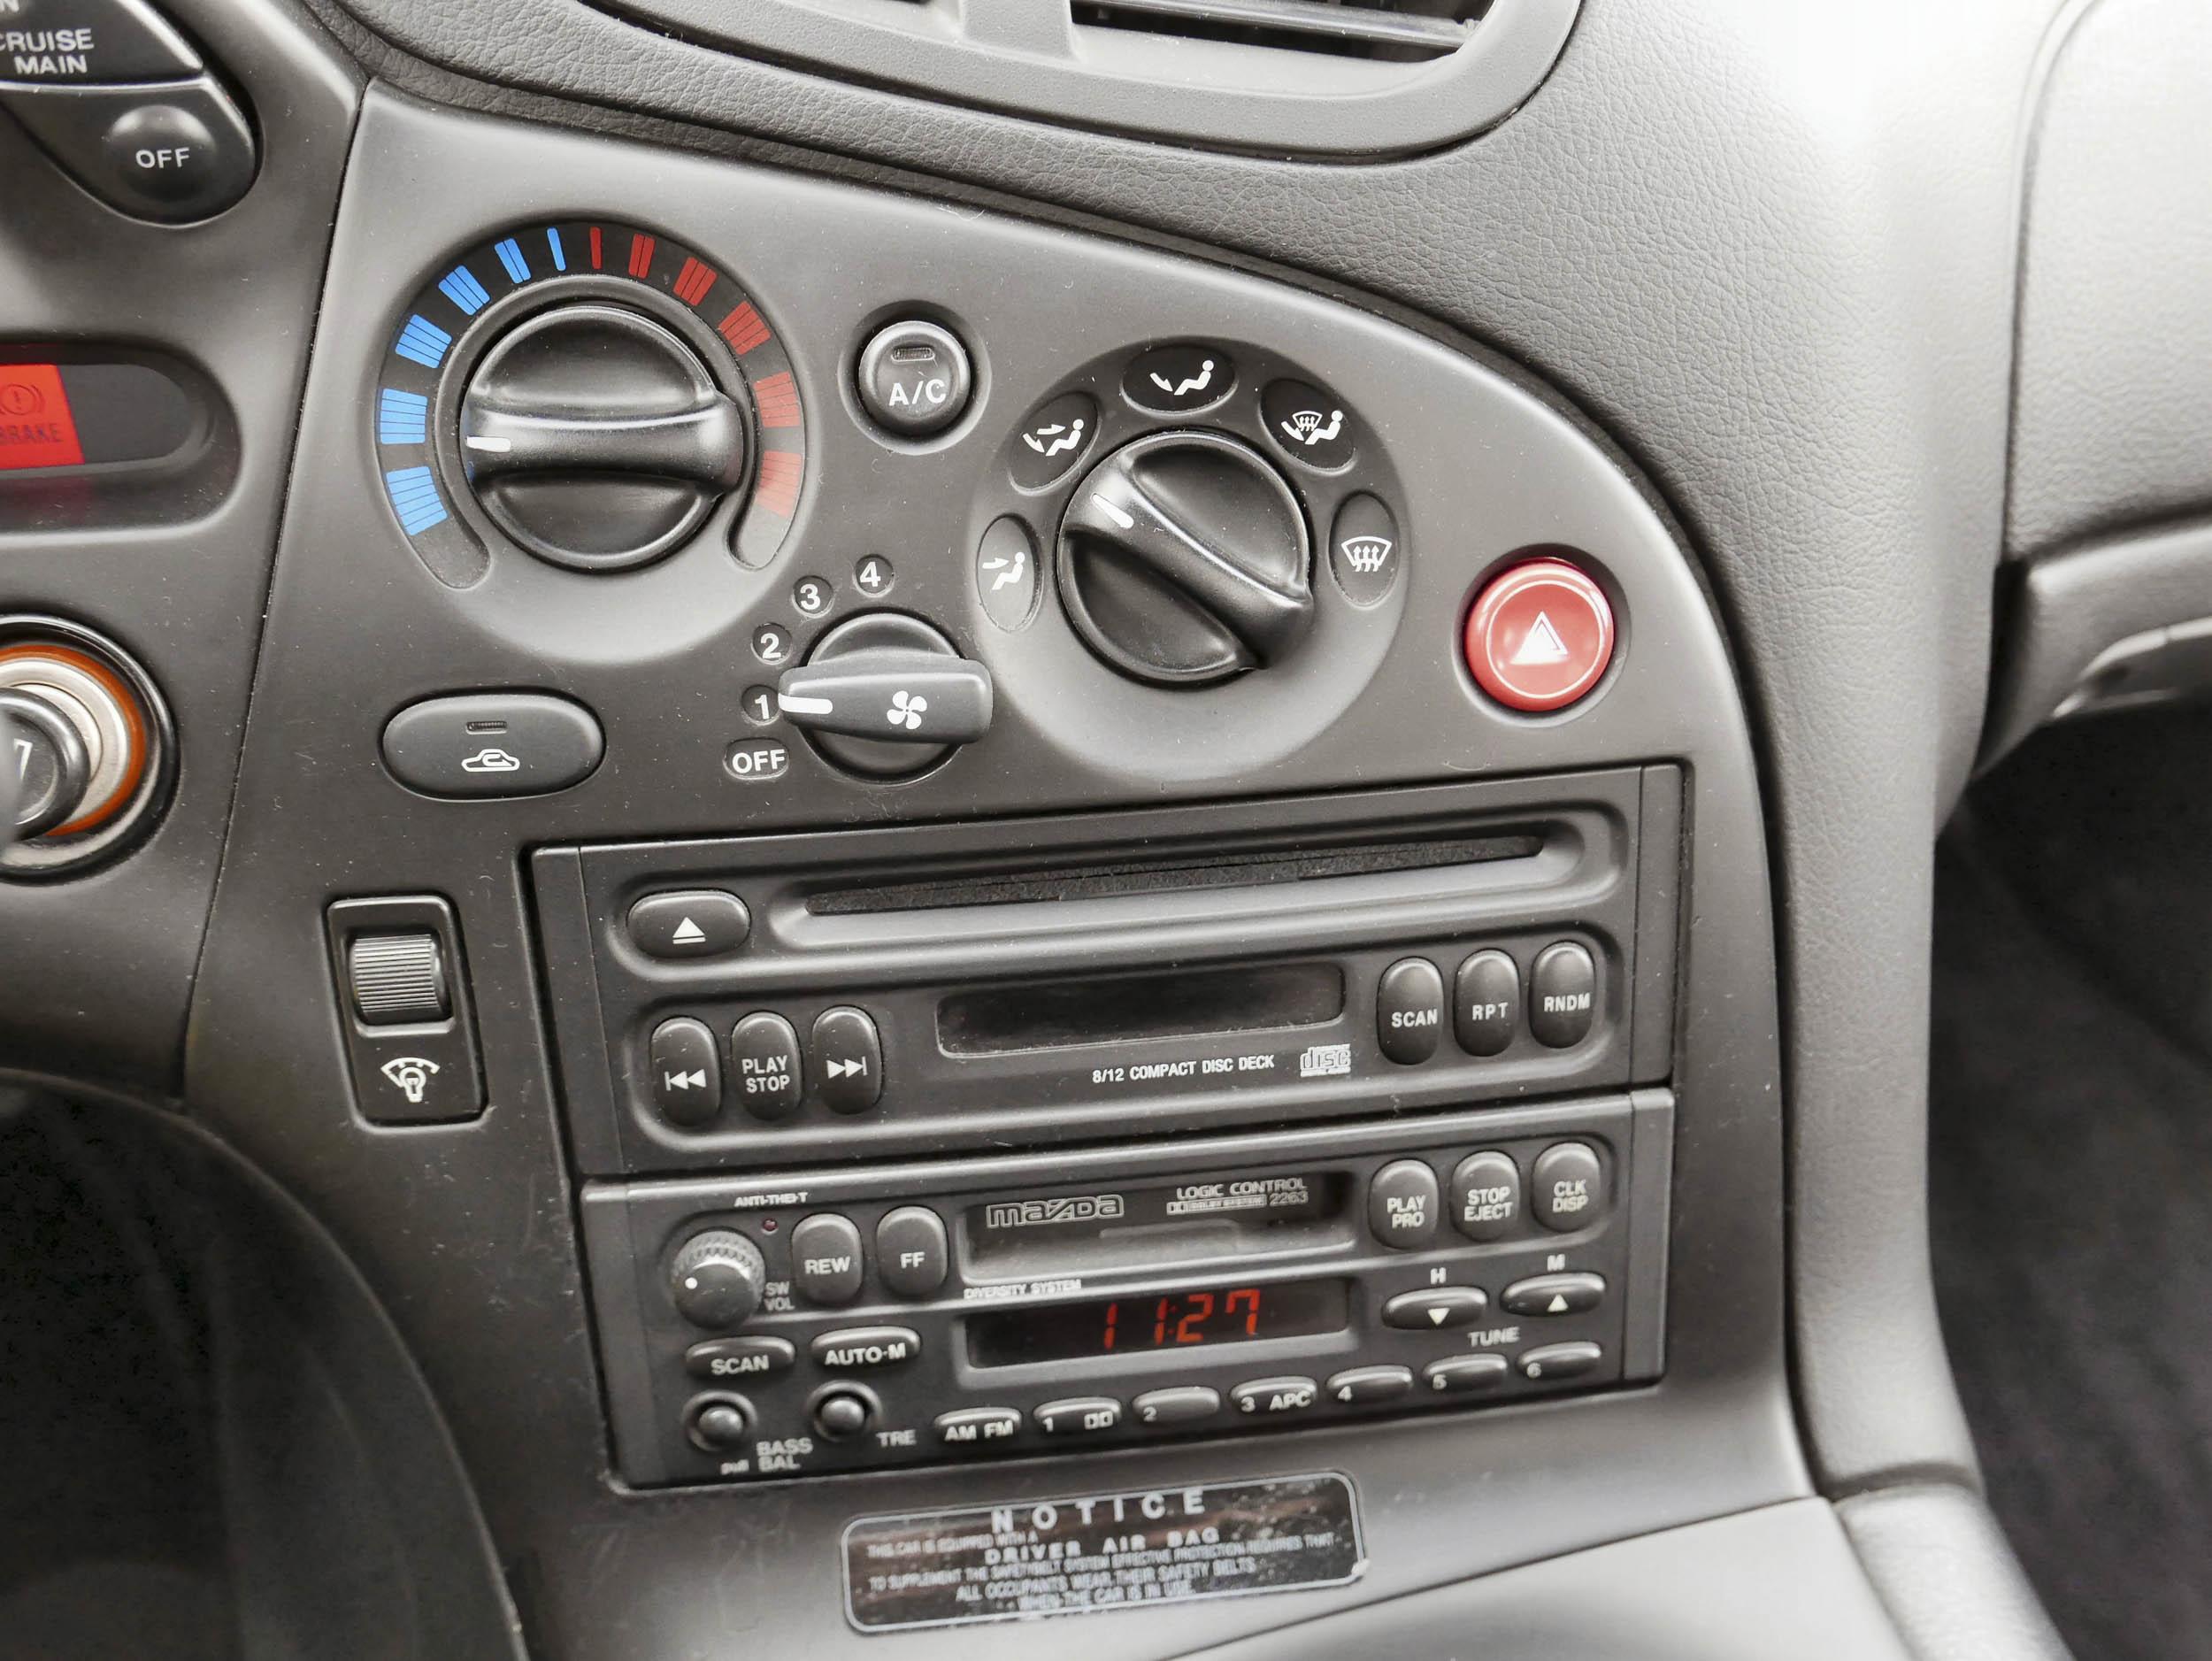 Mazda RX-7 climate and radio control